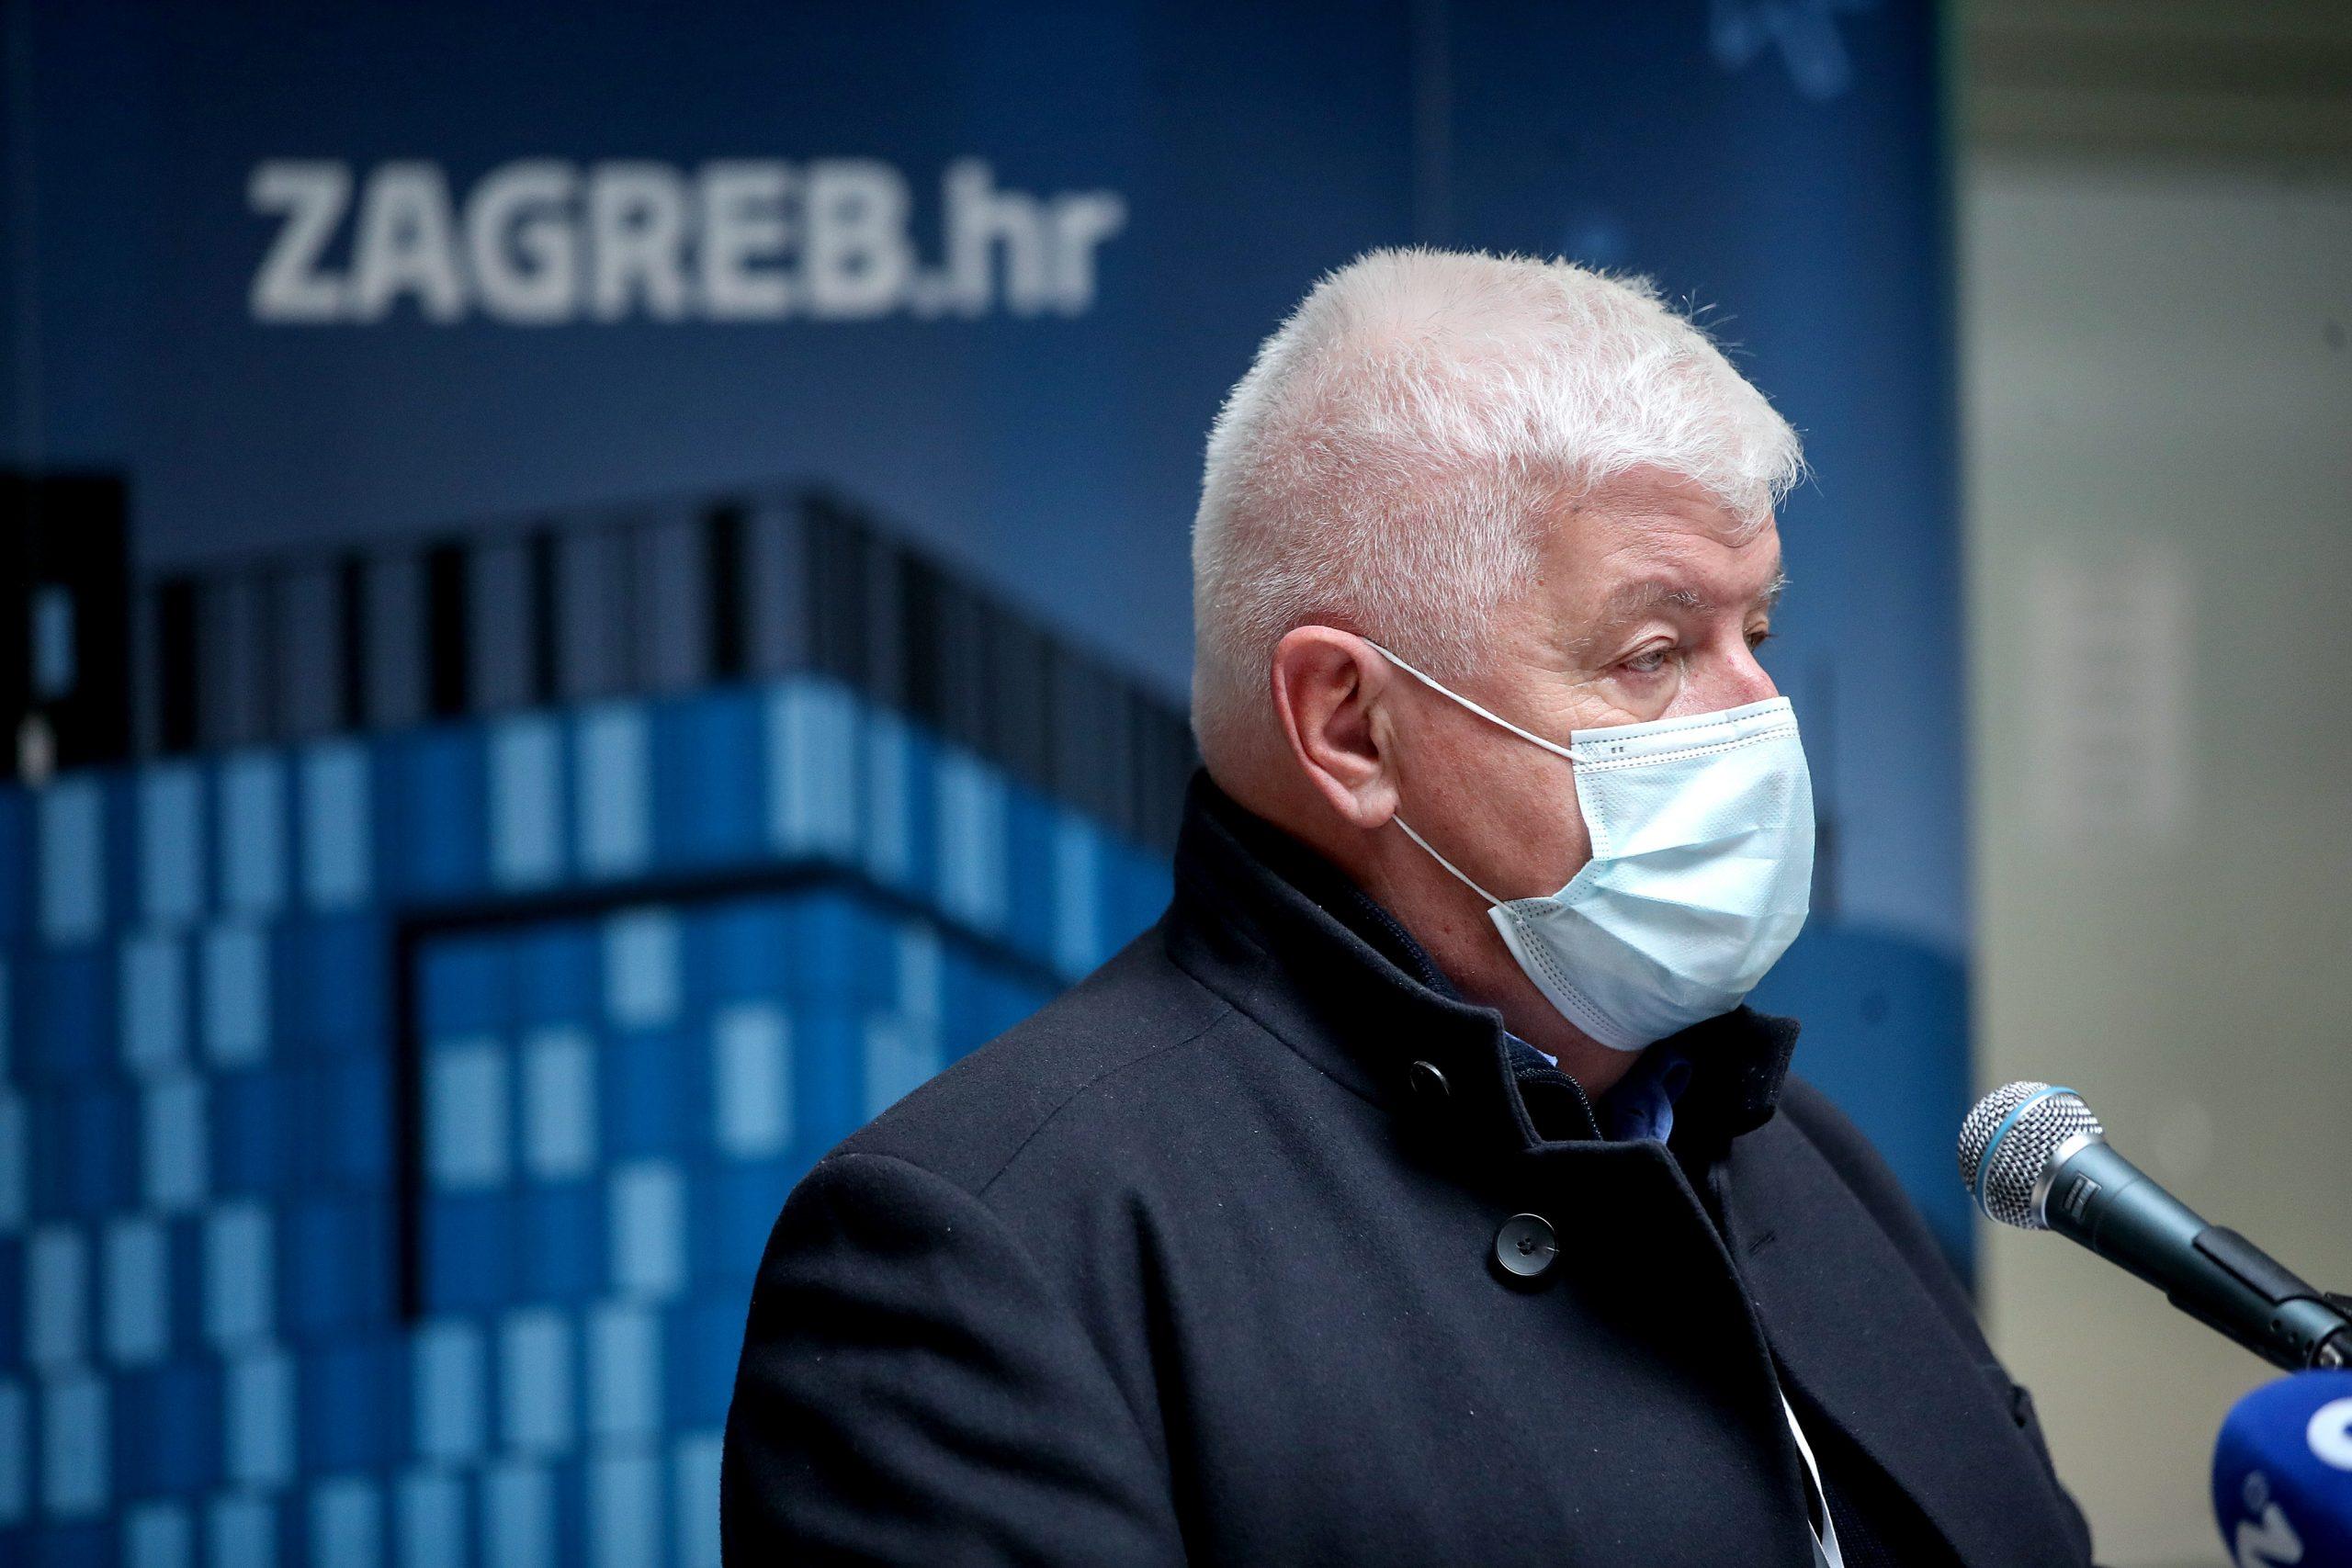 Foto Igor Kralj PIXSELL